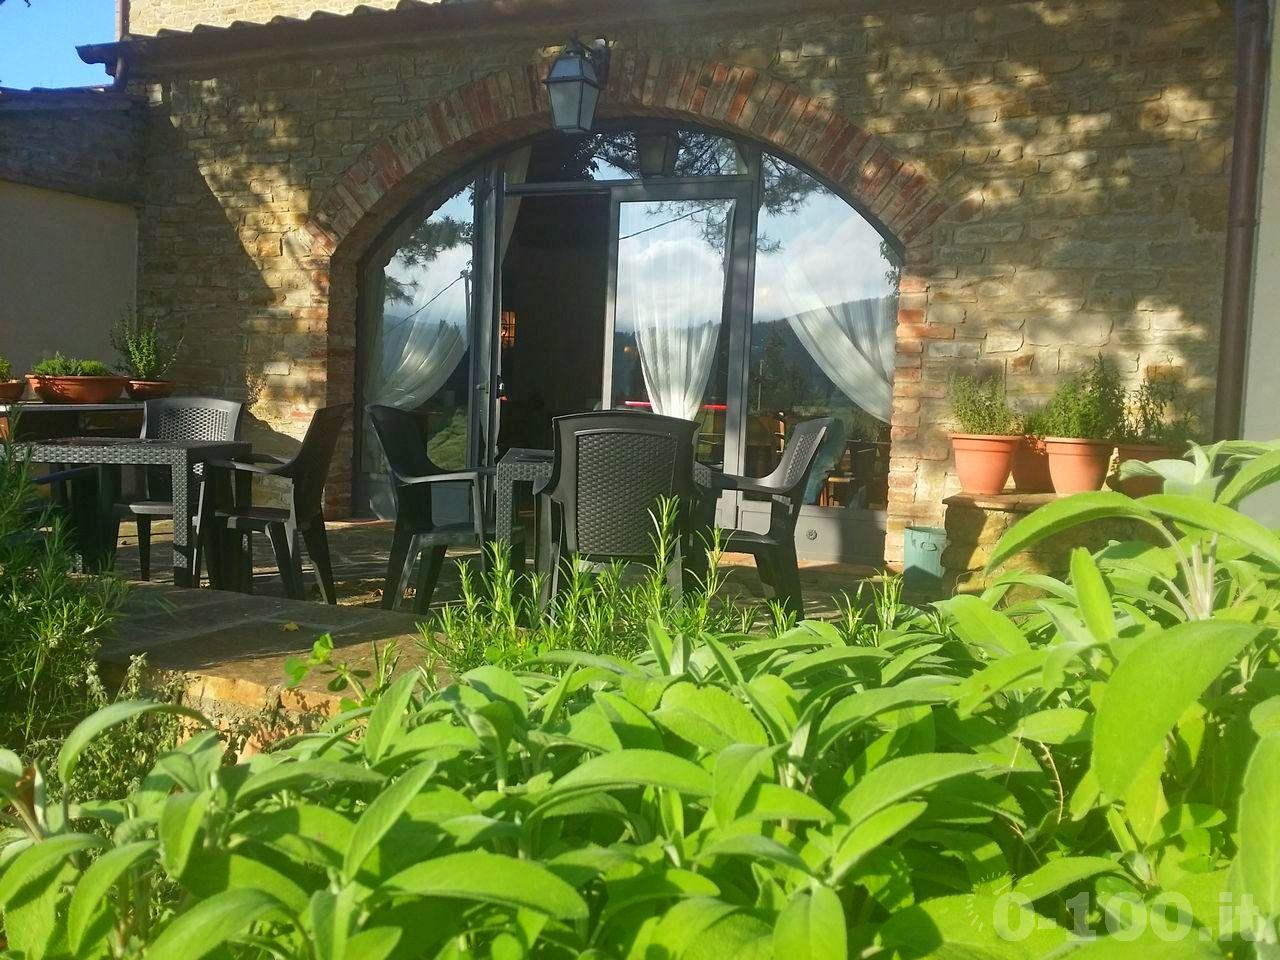 santa-felicita-paterna-turismo-umbria-agriturismo-vacanza-country-house-0-100_9